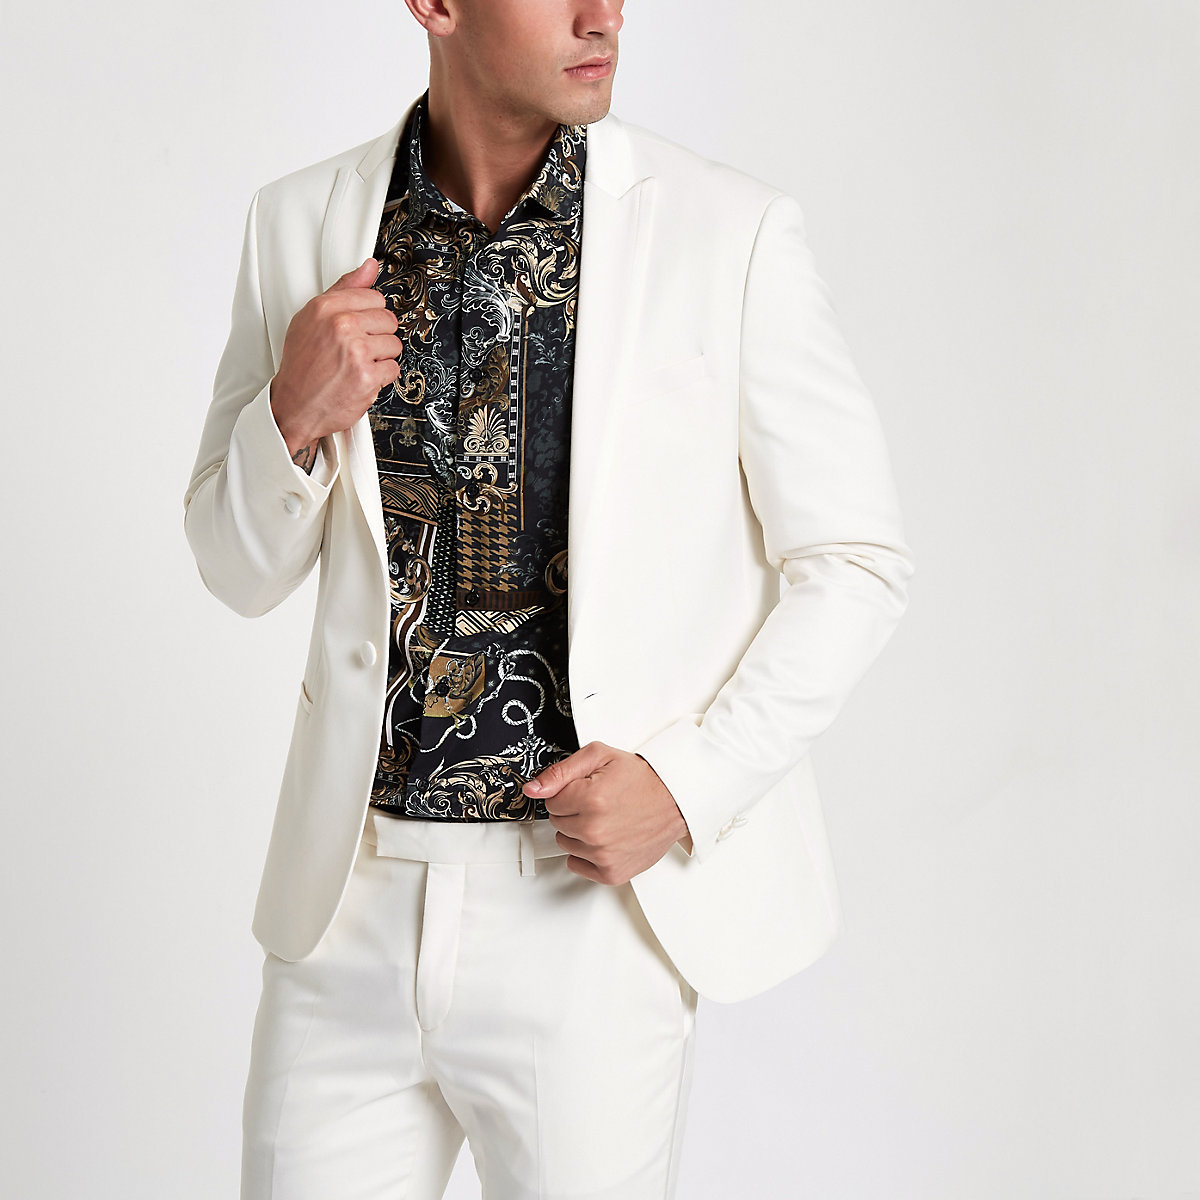 White peak lapel skinny fit suit jacket